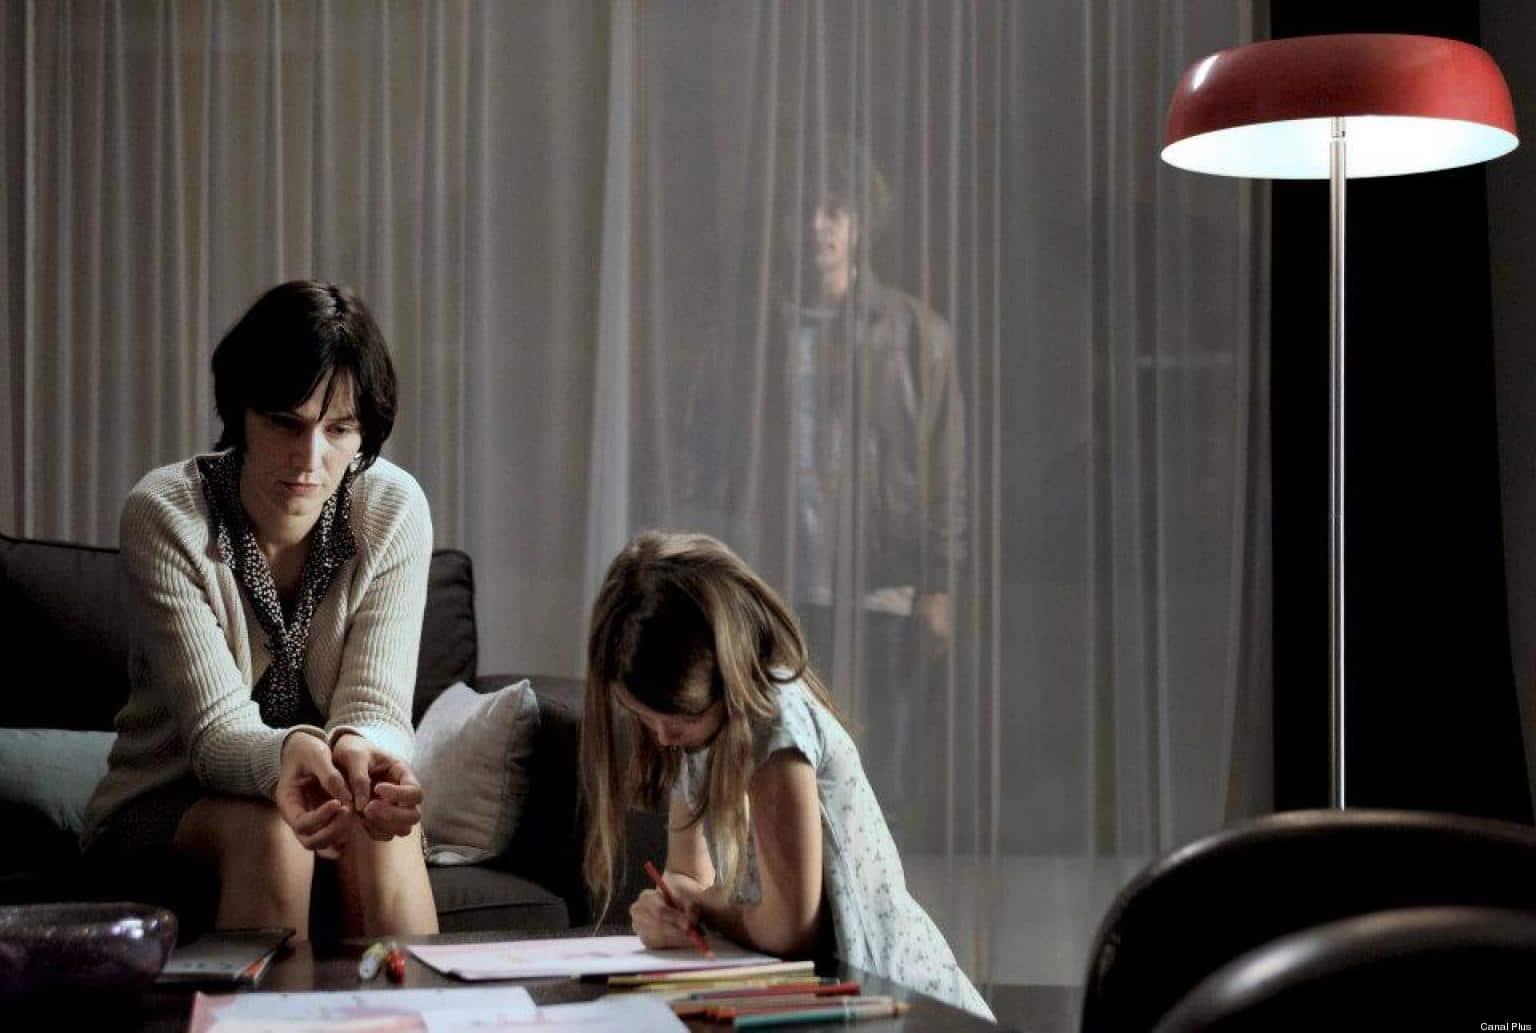 french drama series Les Revenants